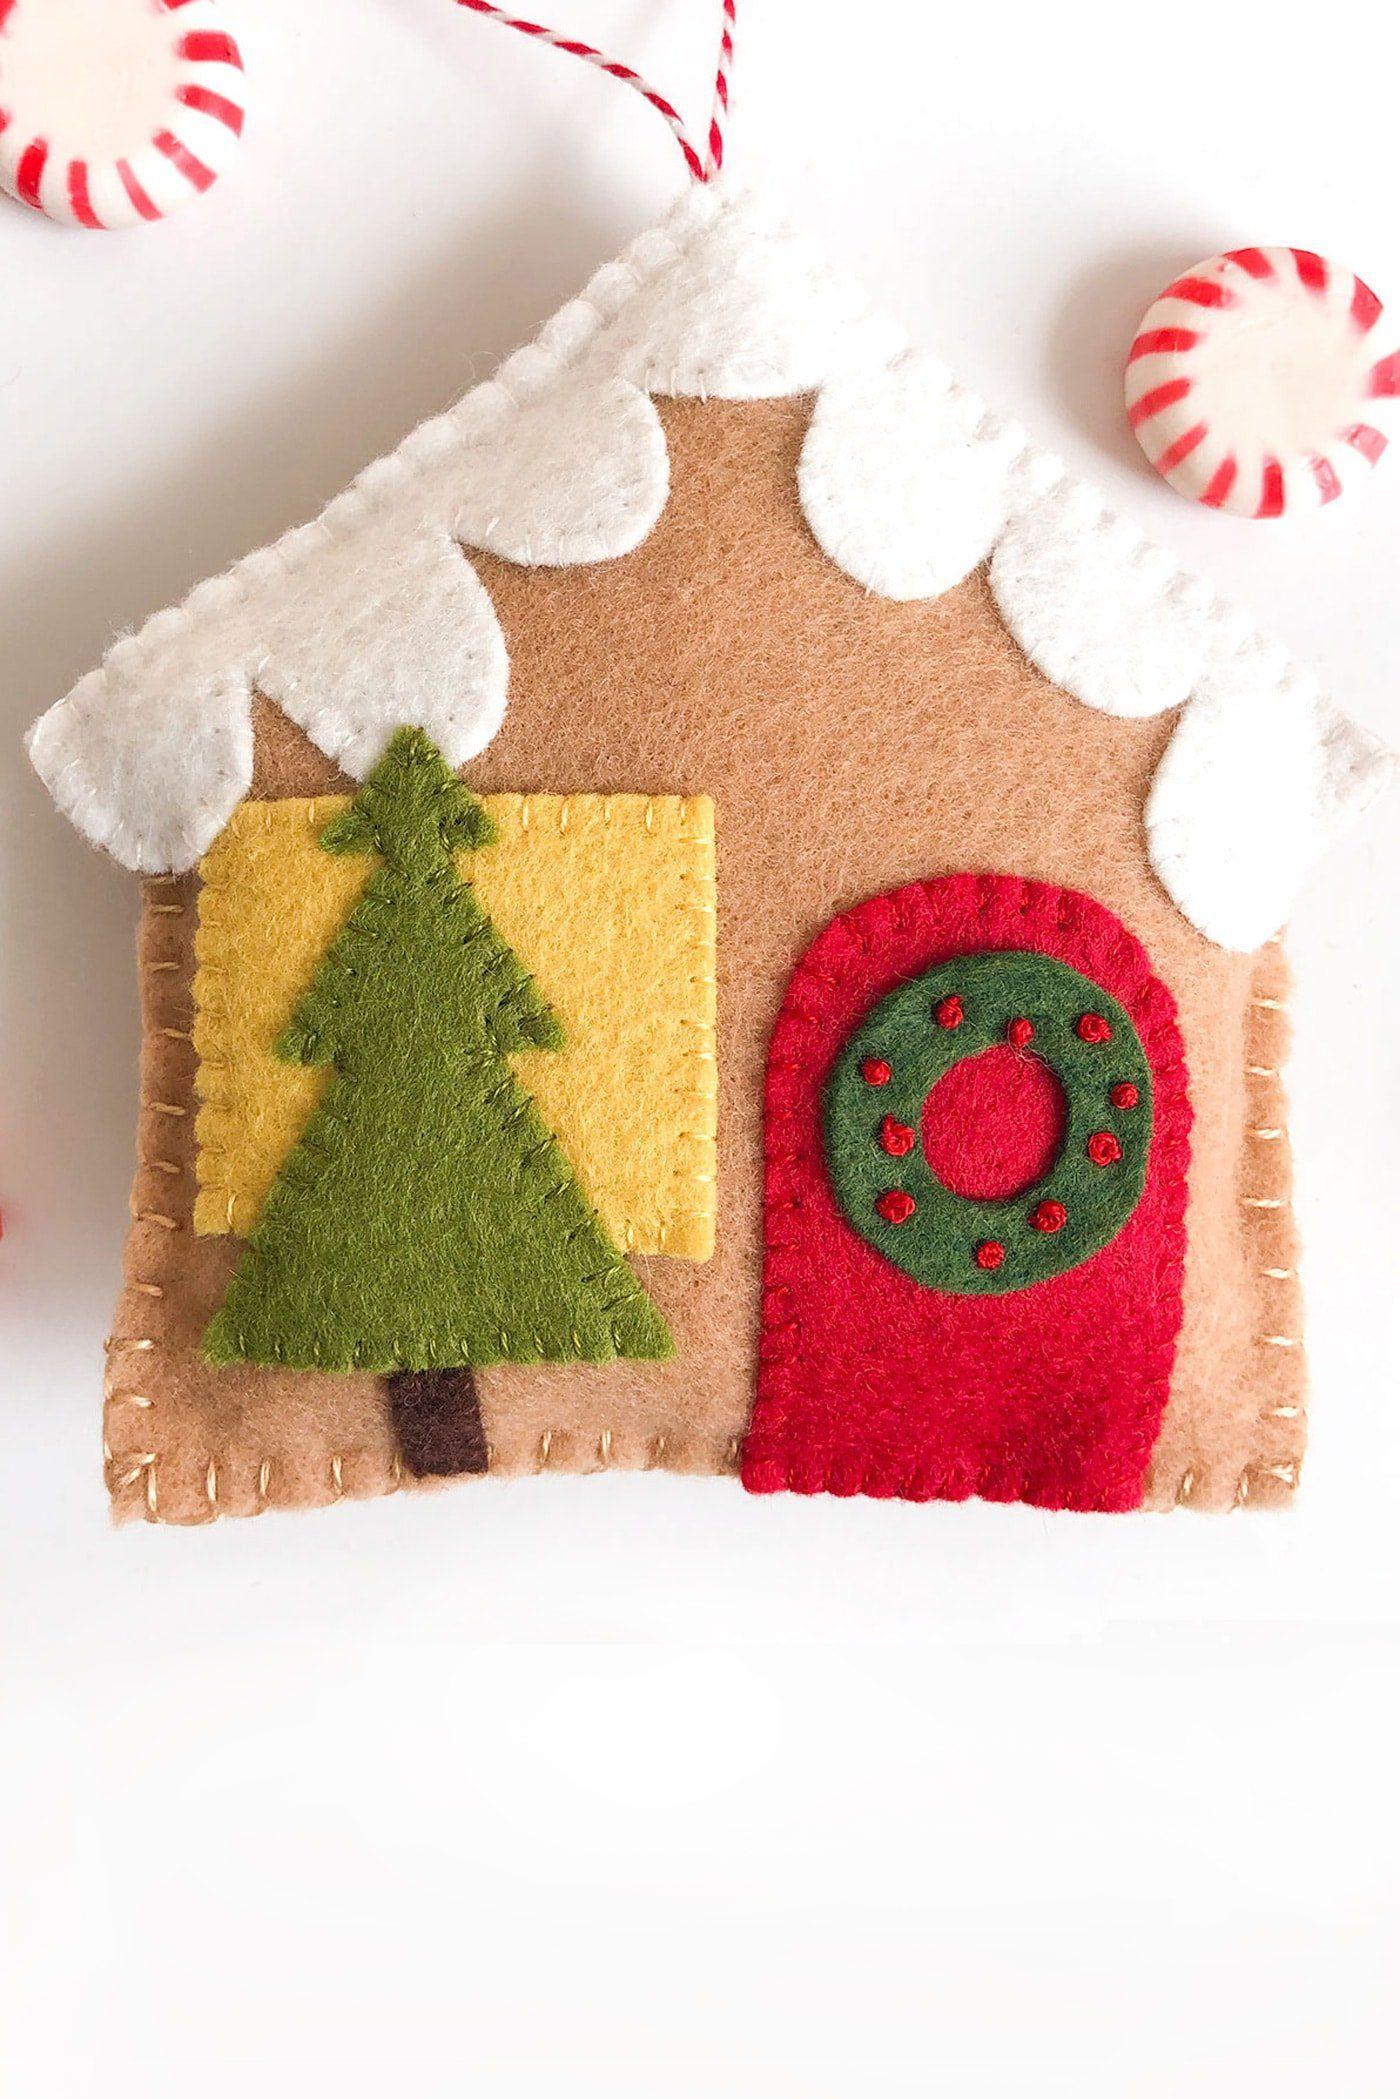 Diy Felt Gingerbread House Christmas Ornaments